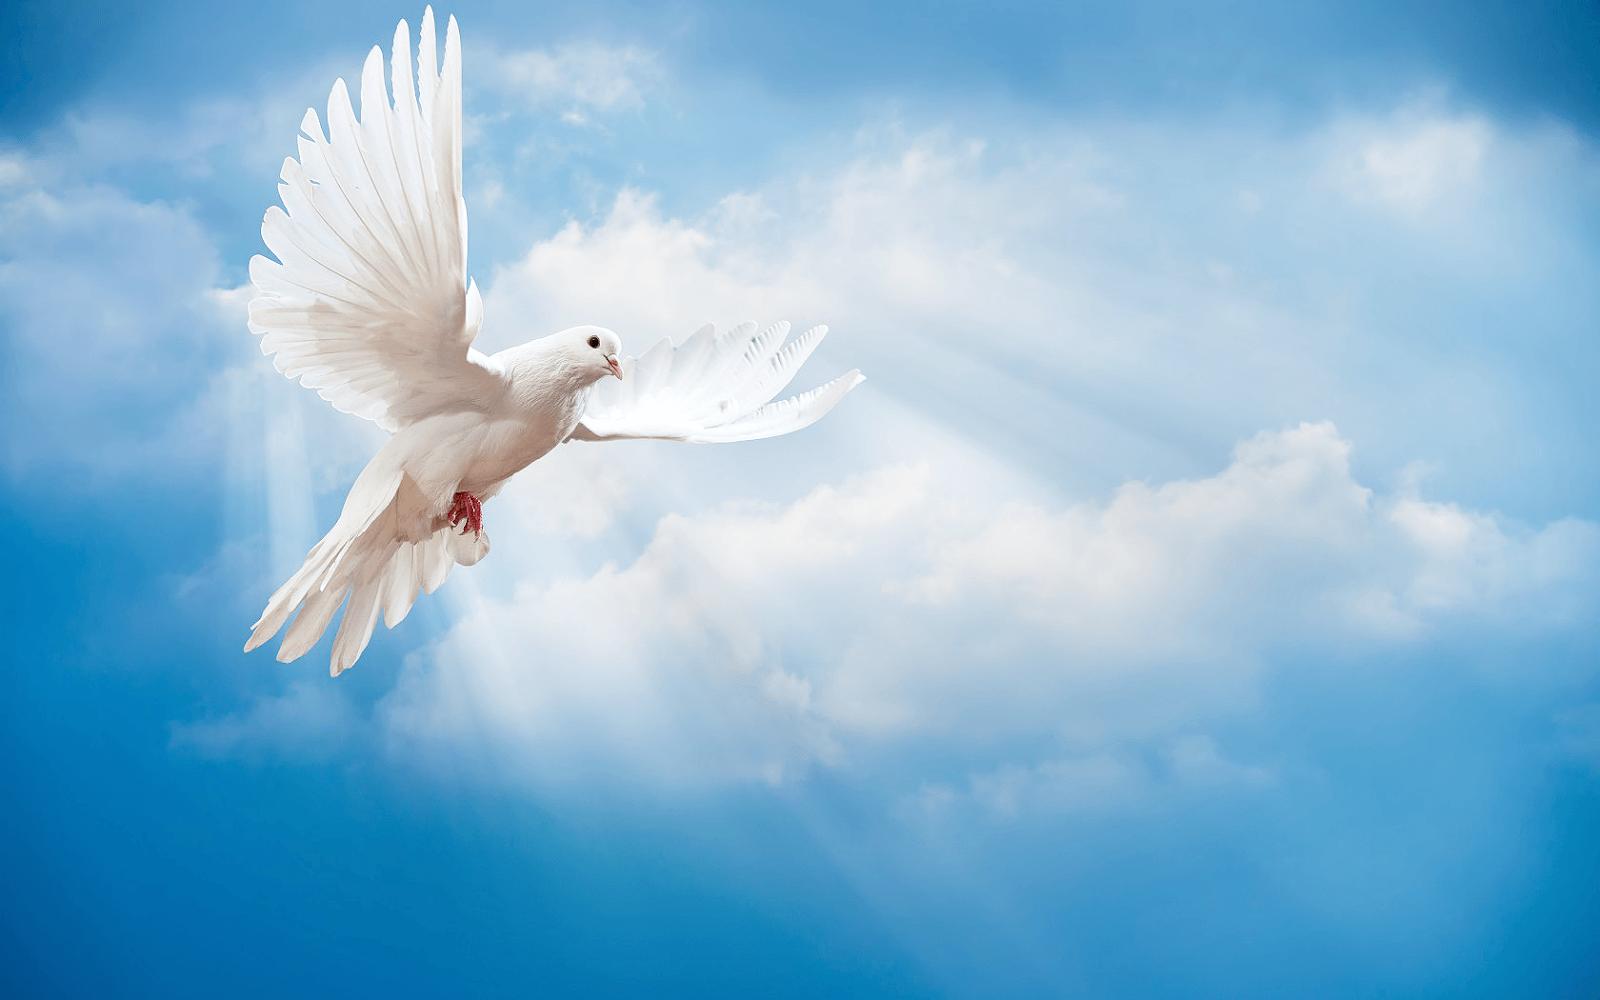 Wallpapers Hd Flying Birds Apple Animals Blue Sky Desktop: Clouds And Birds Wallpaper